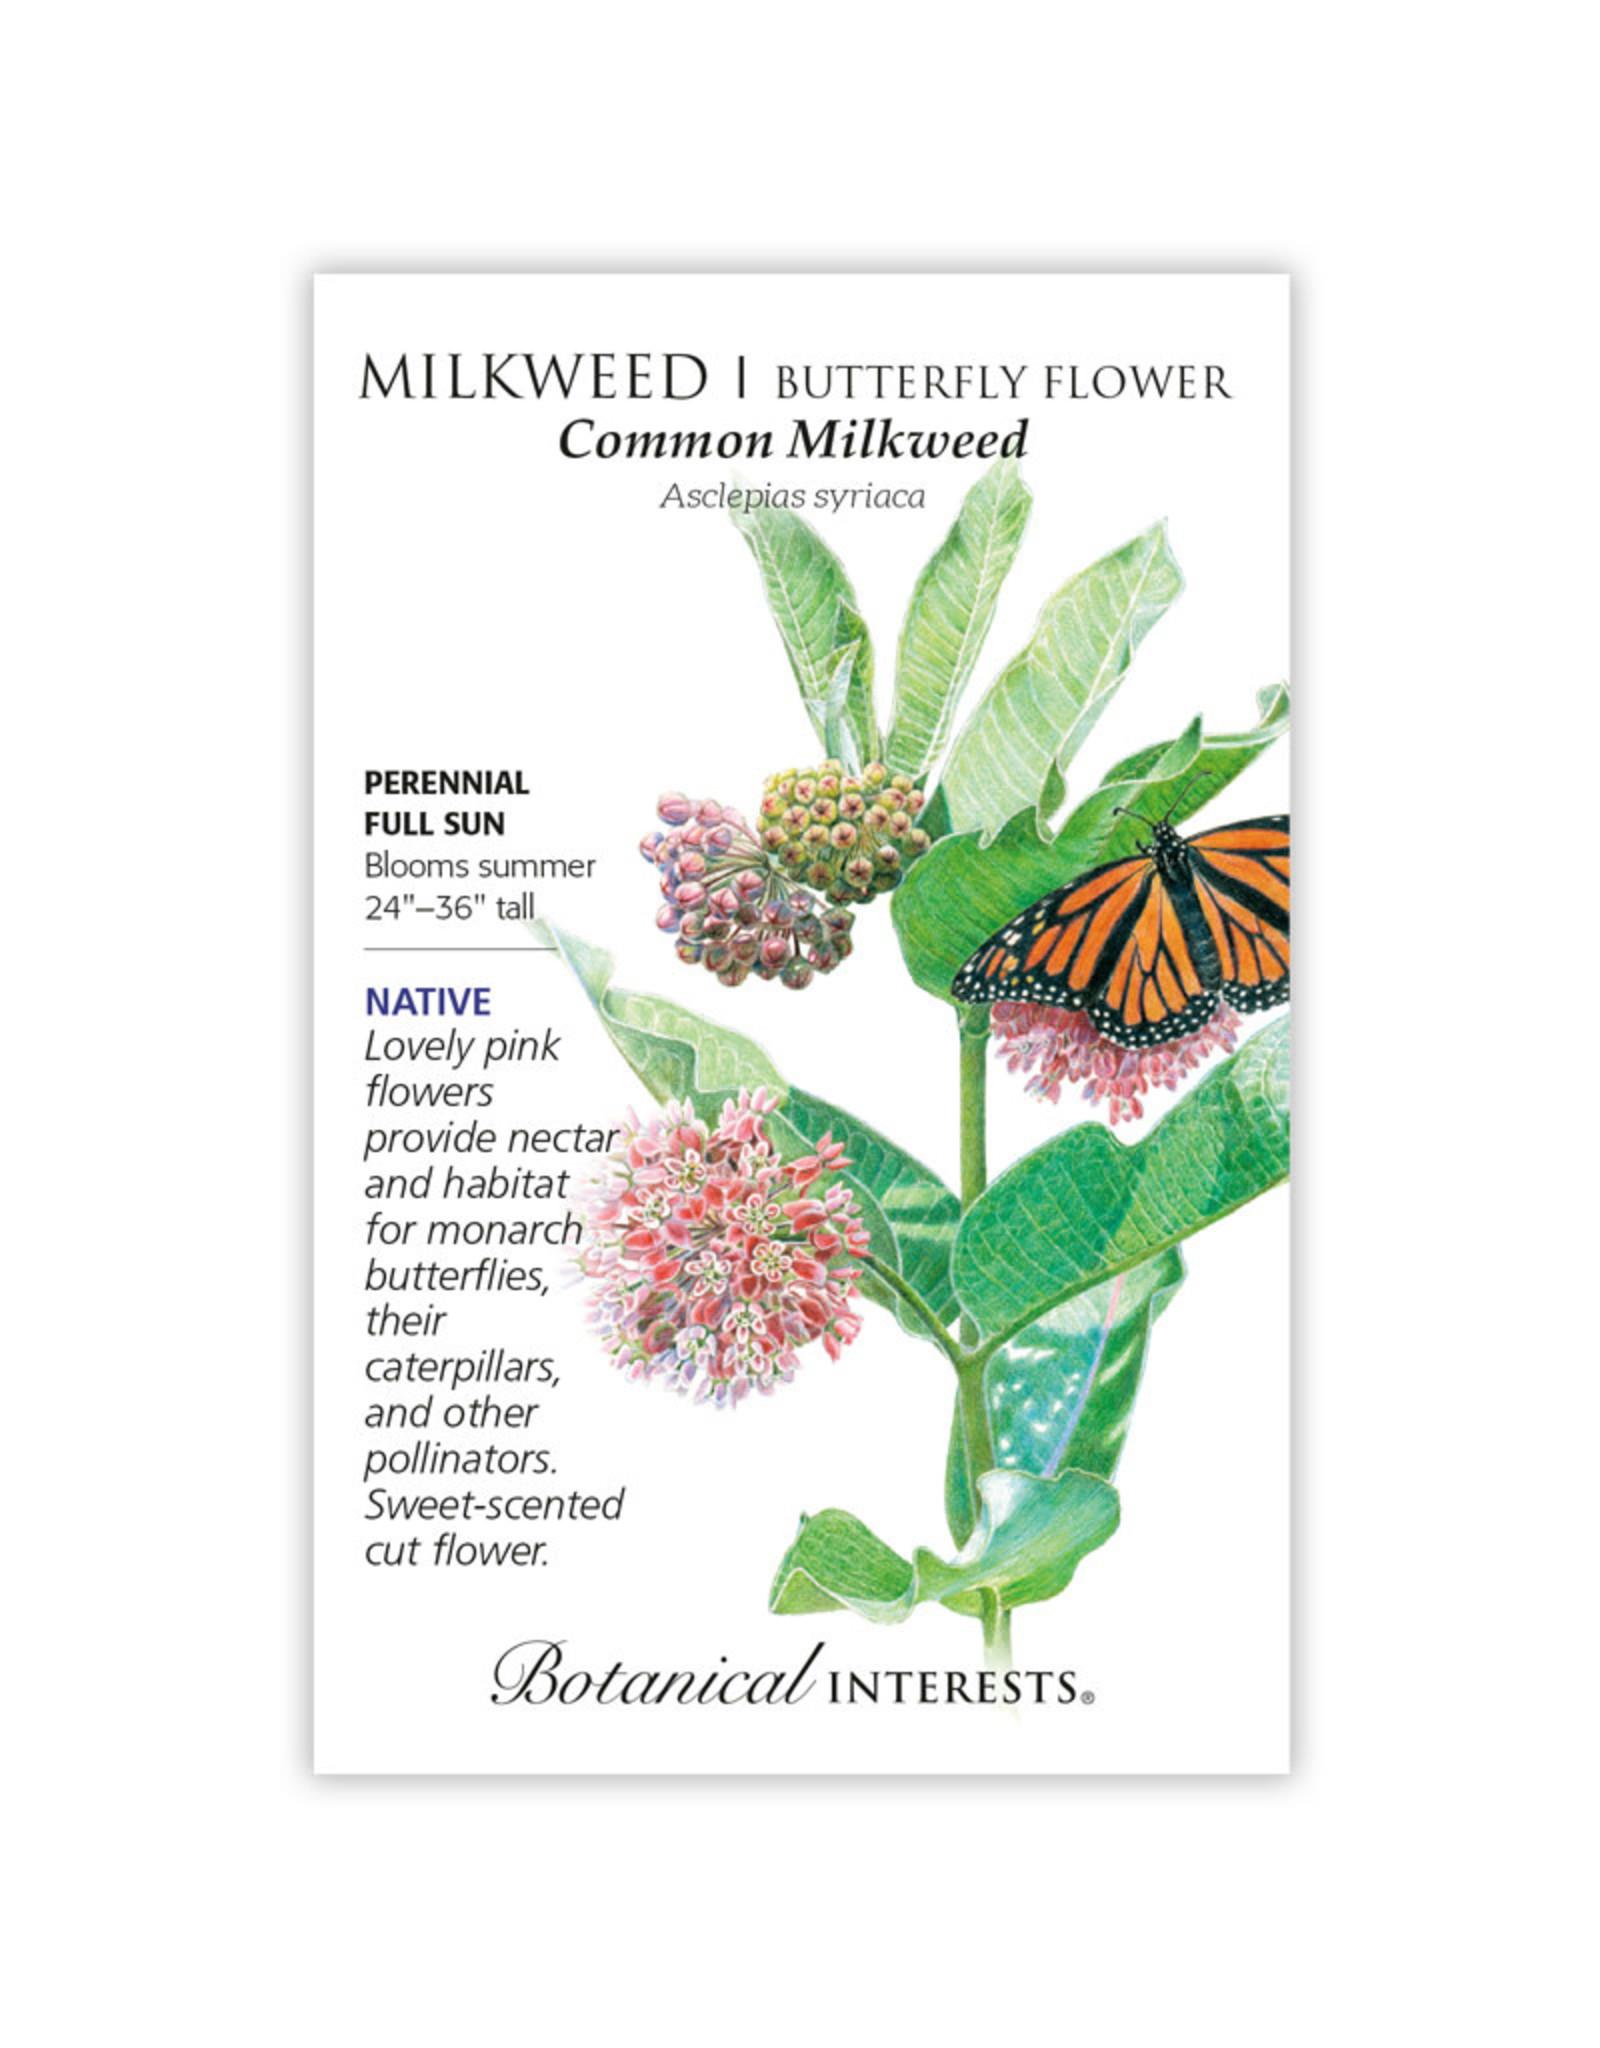 Seeds - Butterfly Flower Milkweed Common